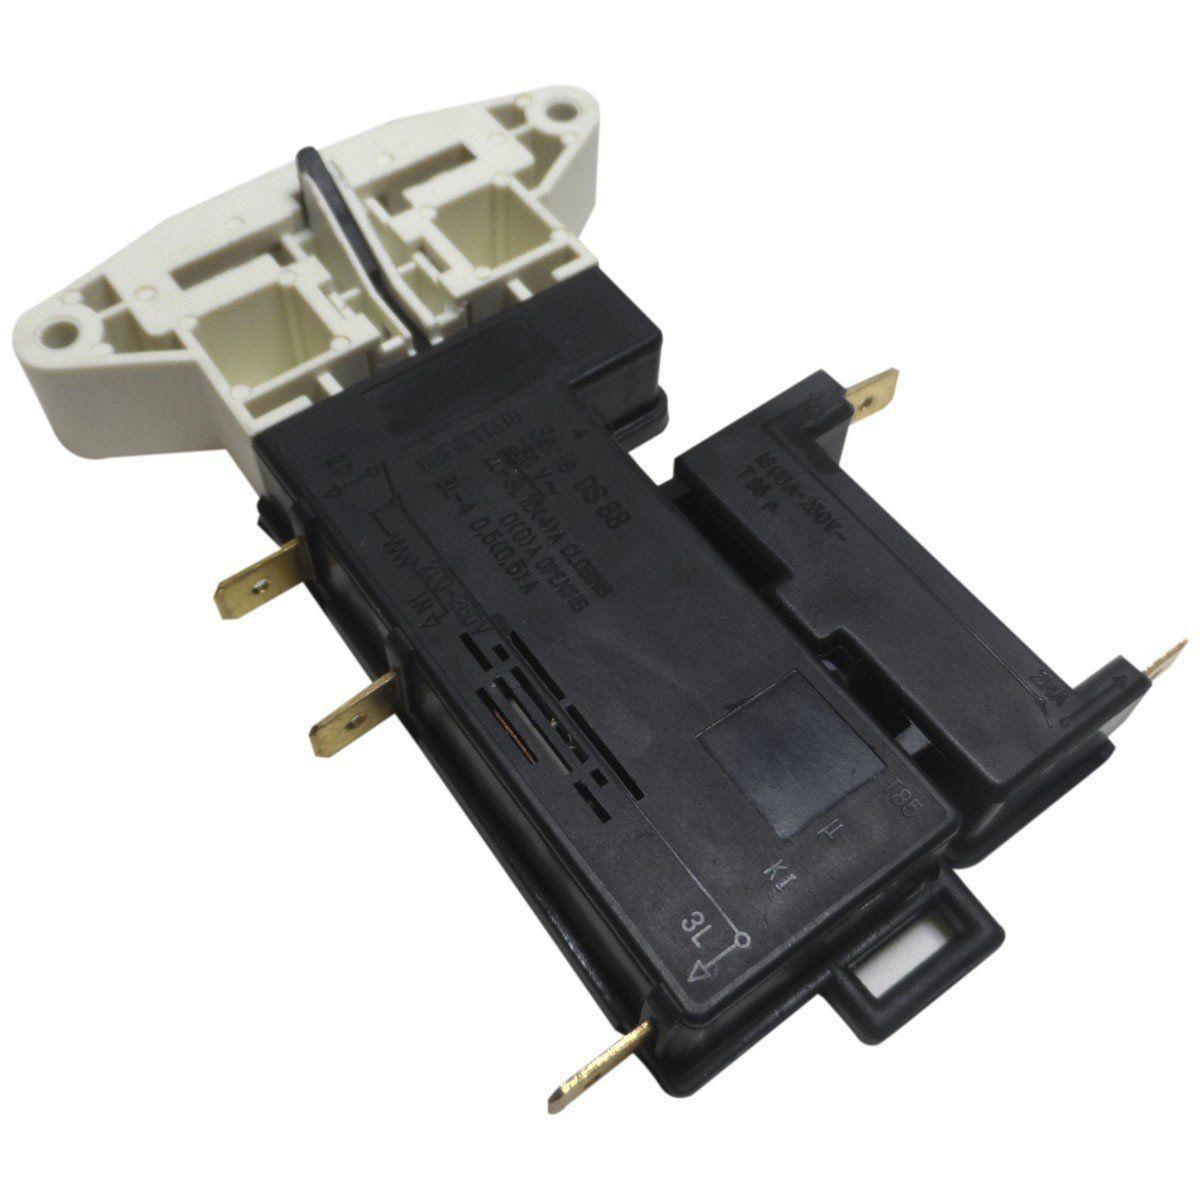 Trava Porta Lavadora Electrolux TOP08 LE08 Prosdocimo 64484383